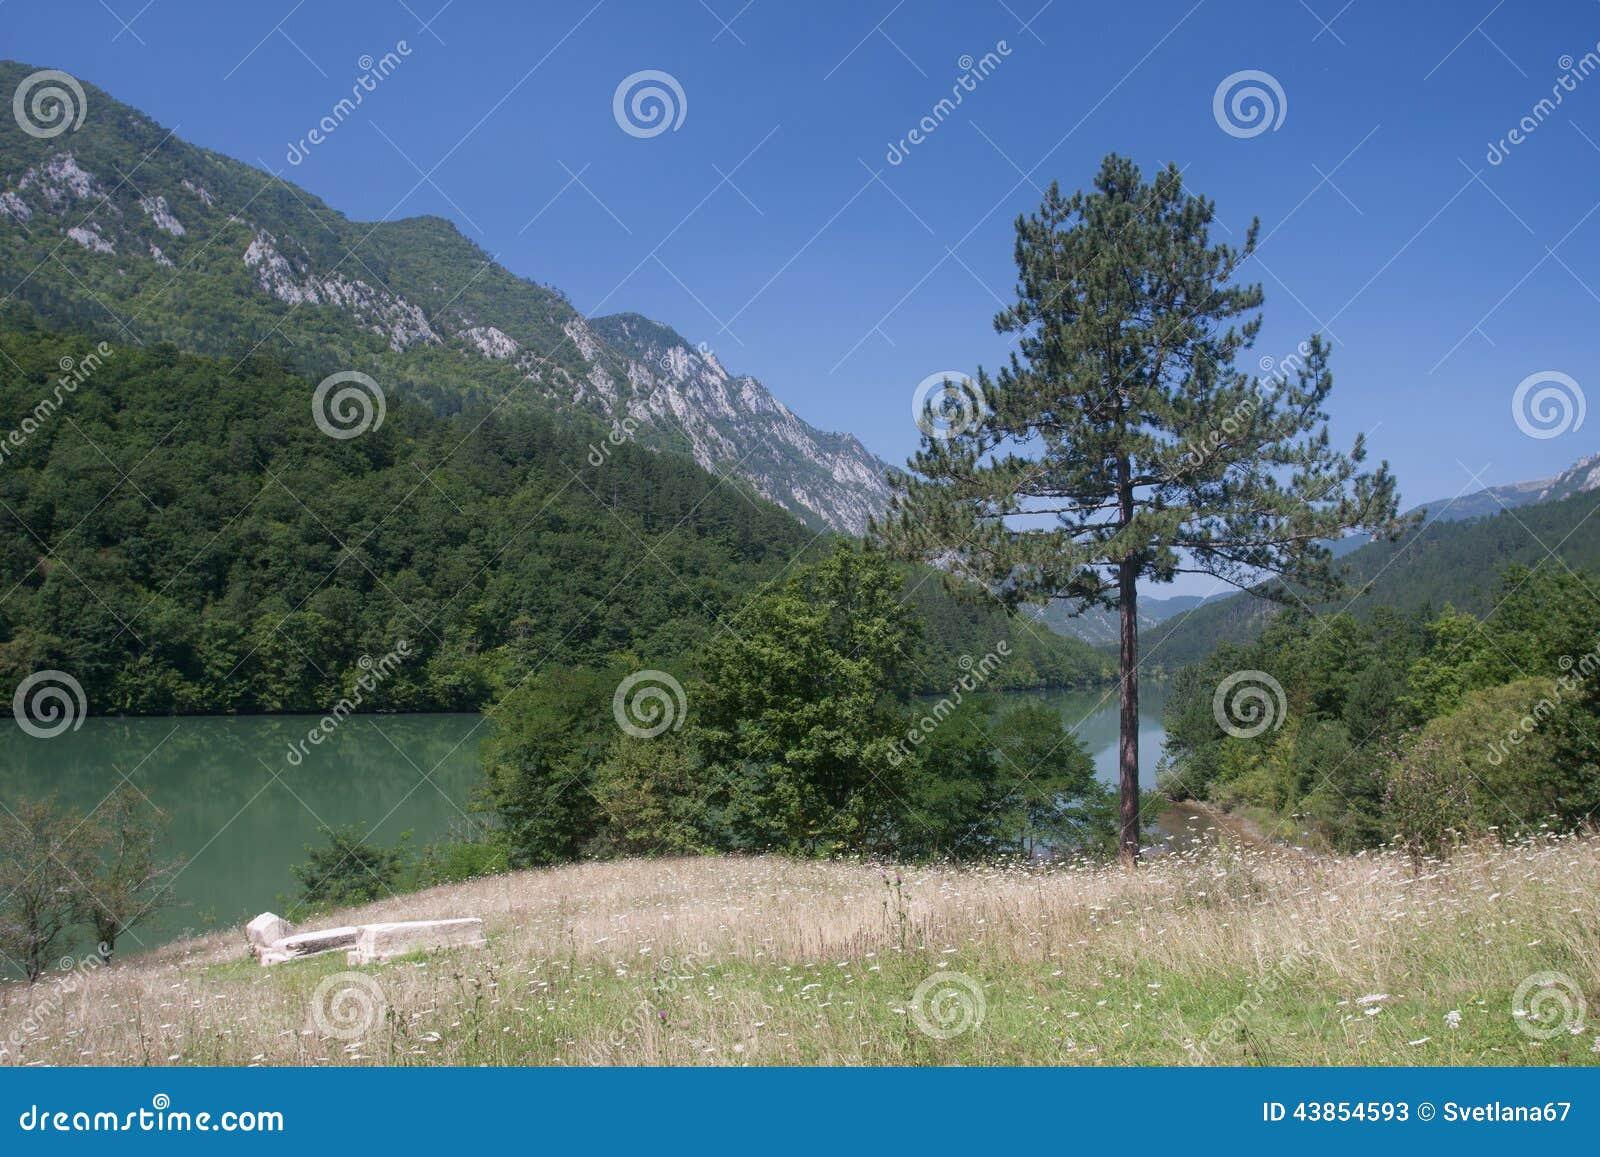 River Drina in Serbia